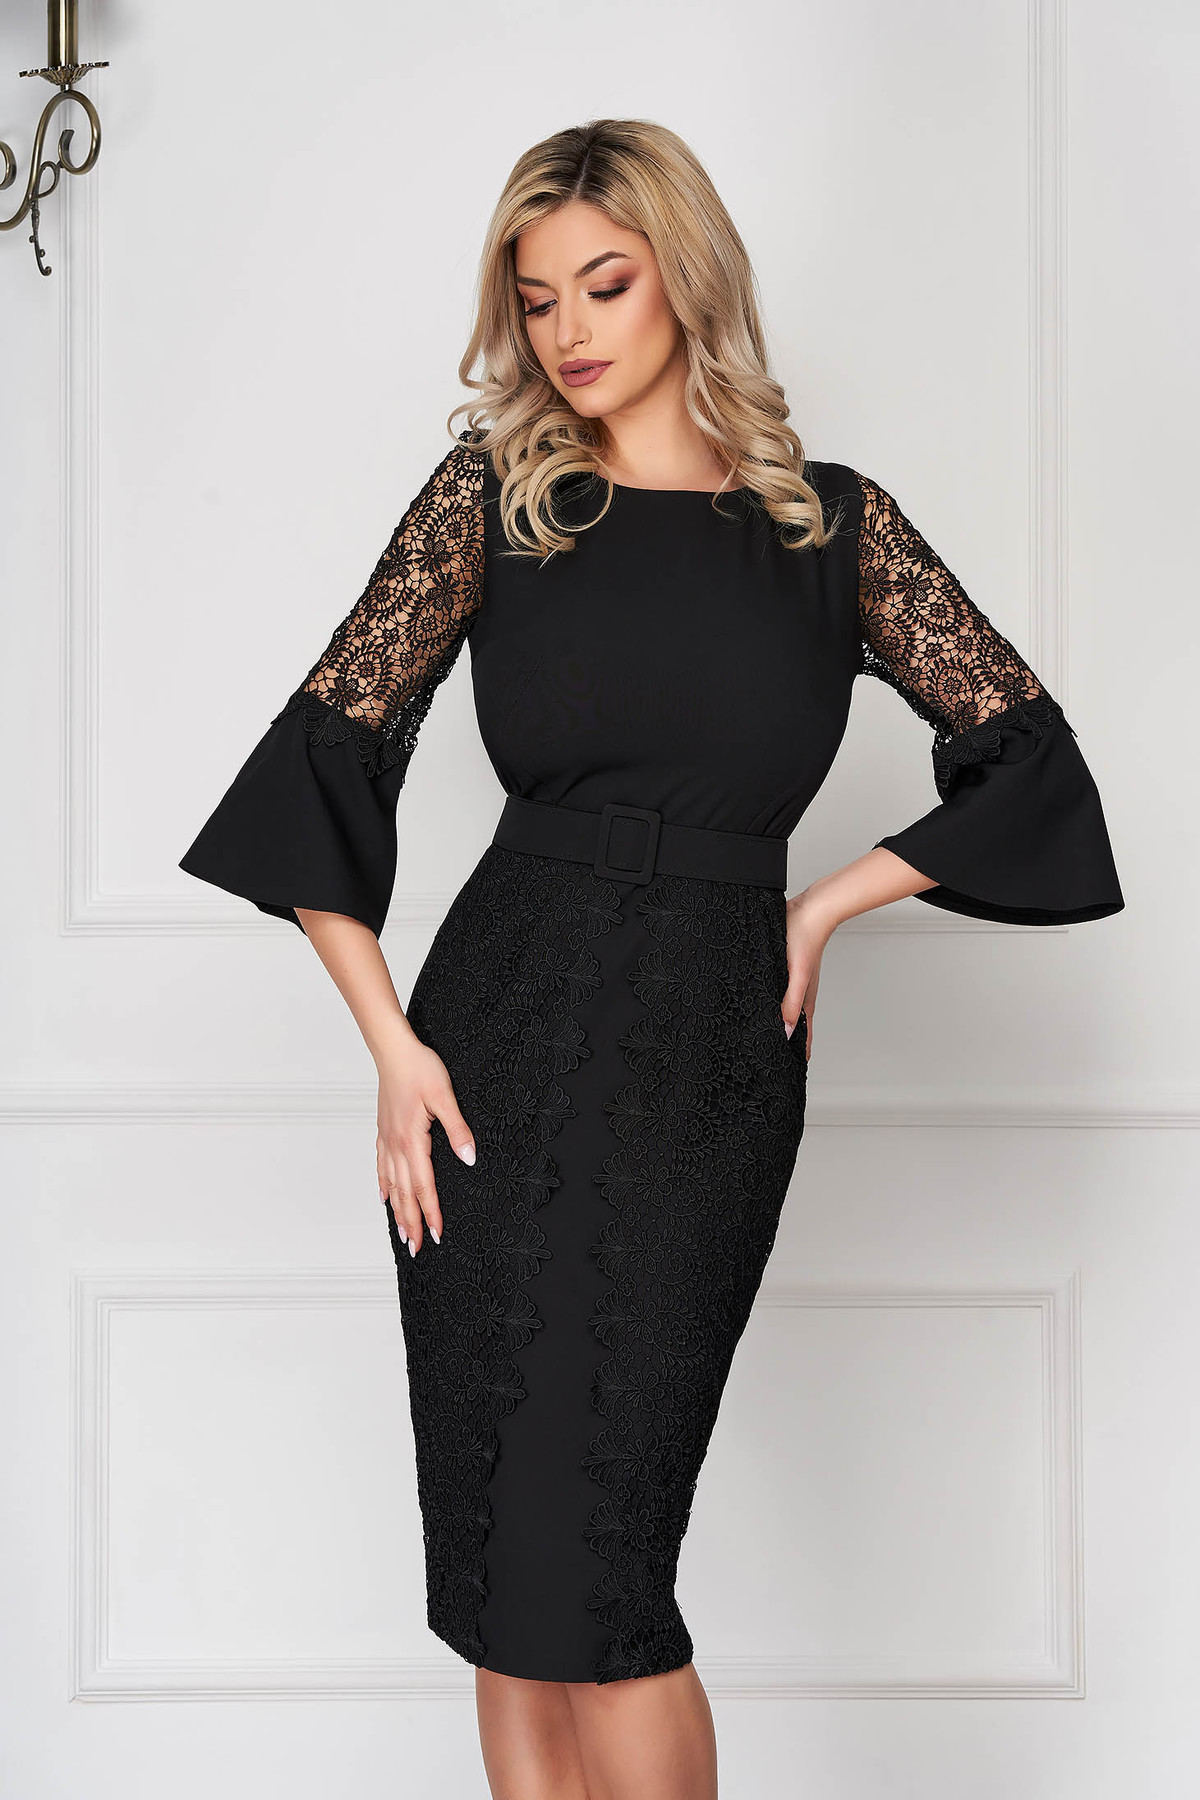 Rochie neagra eleganta midi tip creion din stofa subtire cu aplicatii de broderie florala